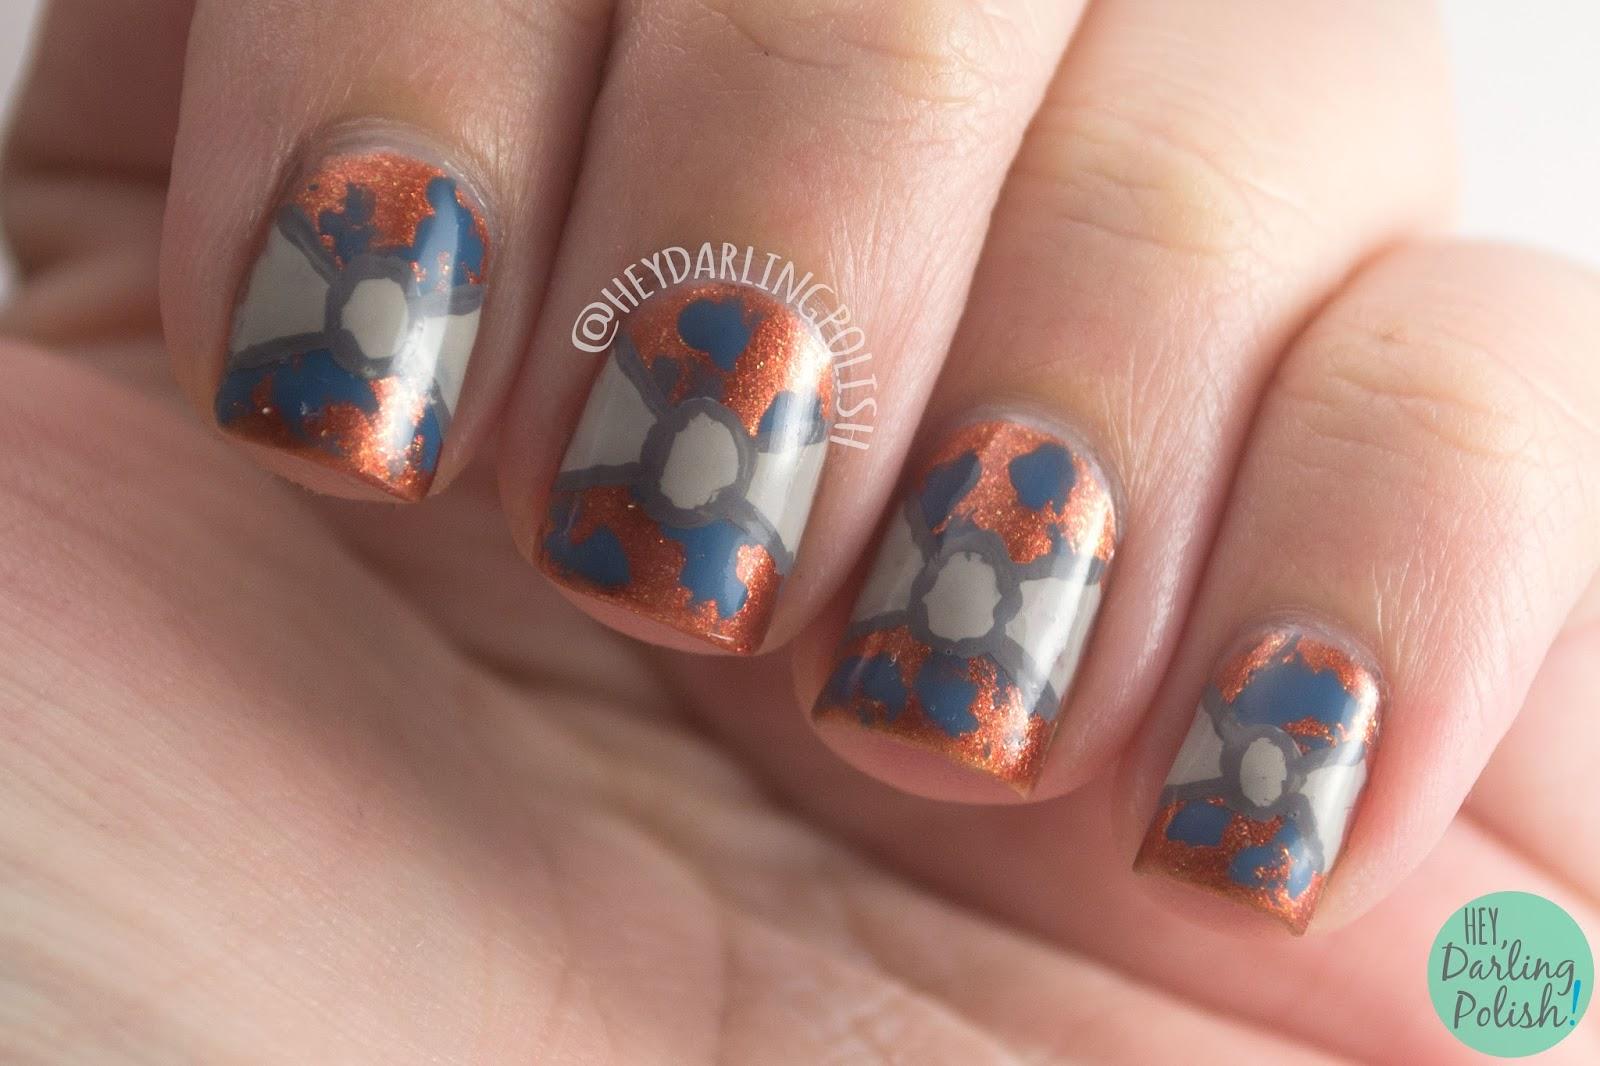 Hey, Darling Polish!: The Nail Art Guild: Fall/Winter Fashion